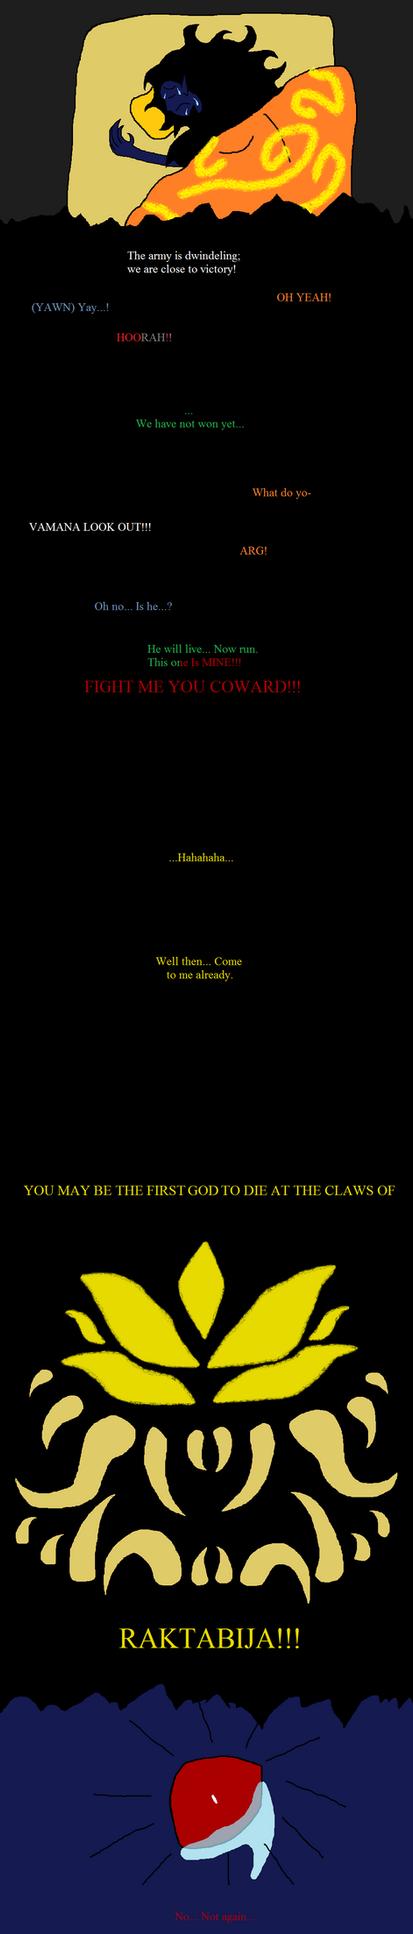 Raktabija preview for SMITE by TORVUSANDFRIENDS